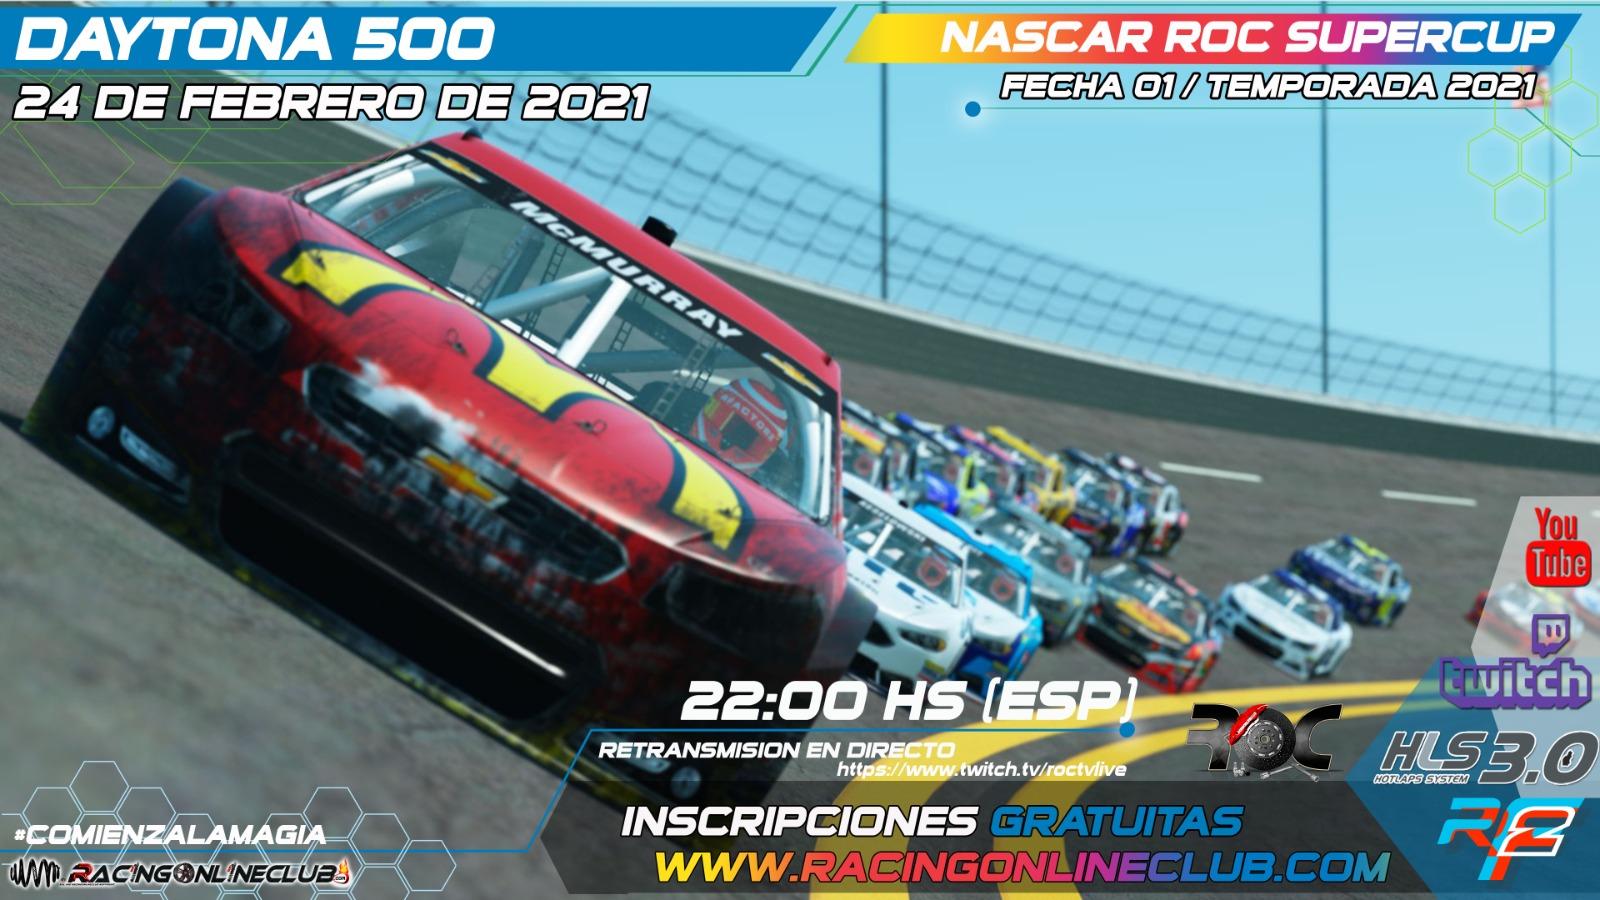 NASCAR RFACTOR DAYTONA